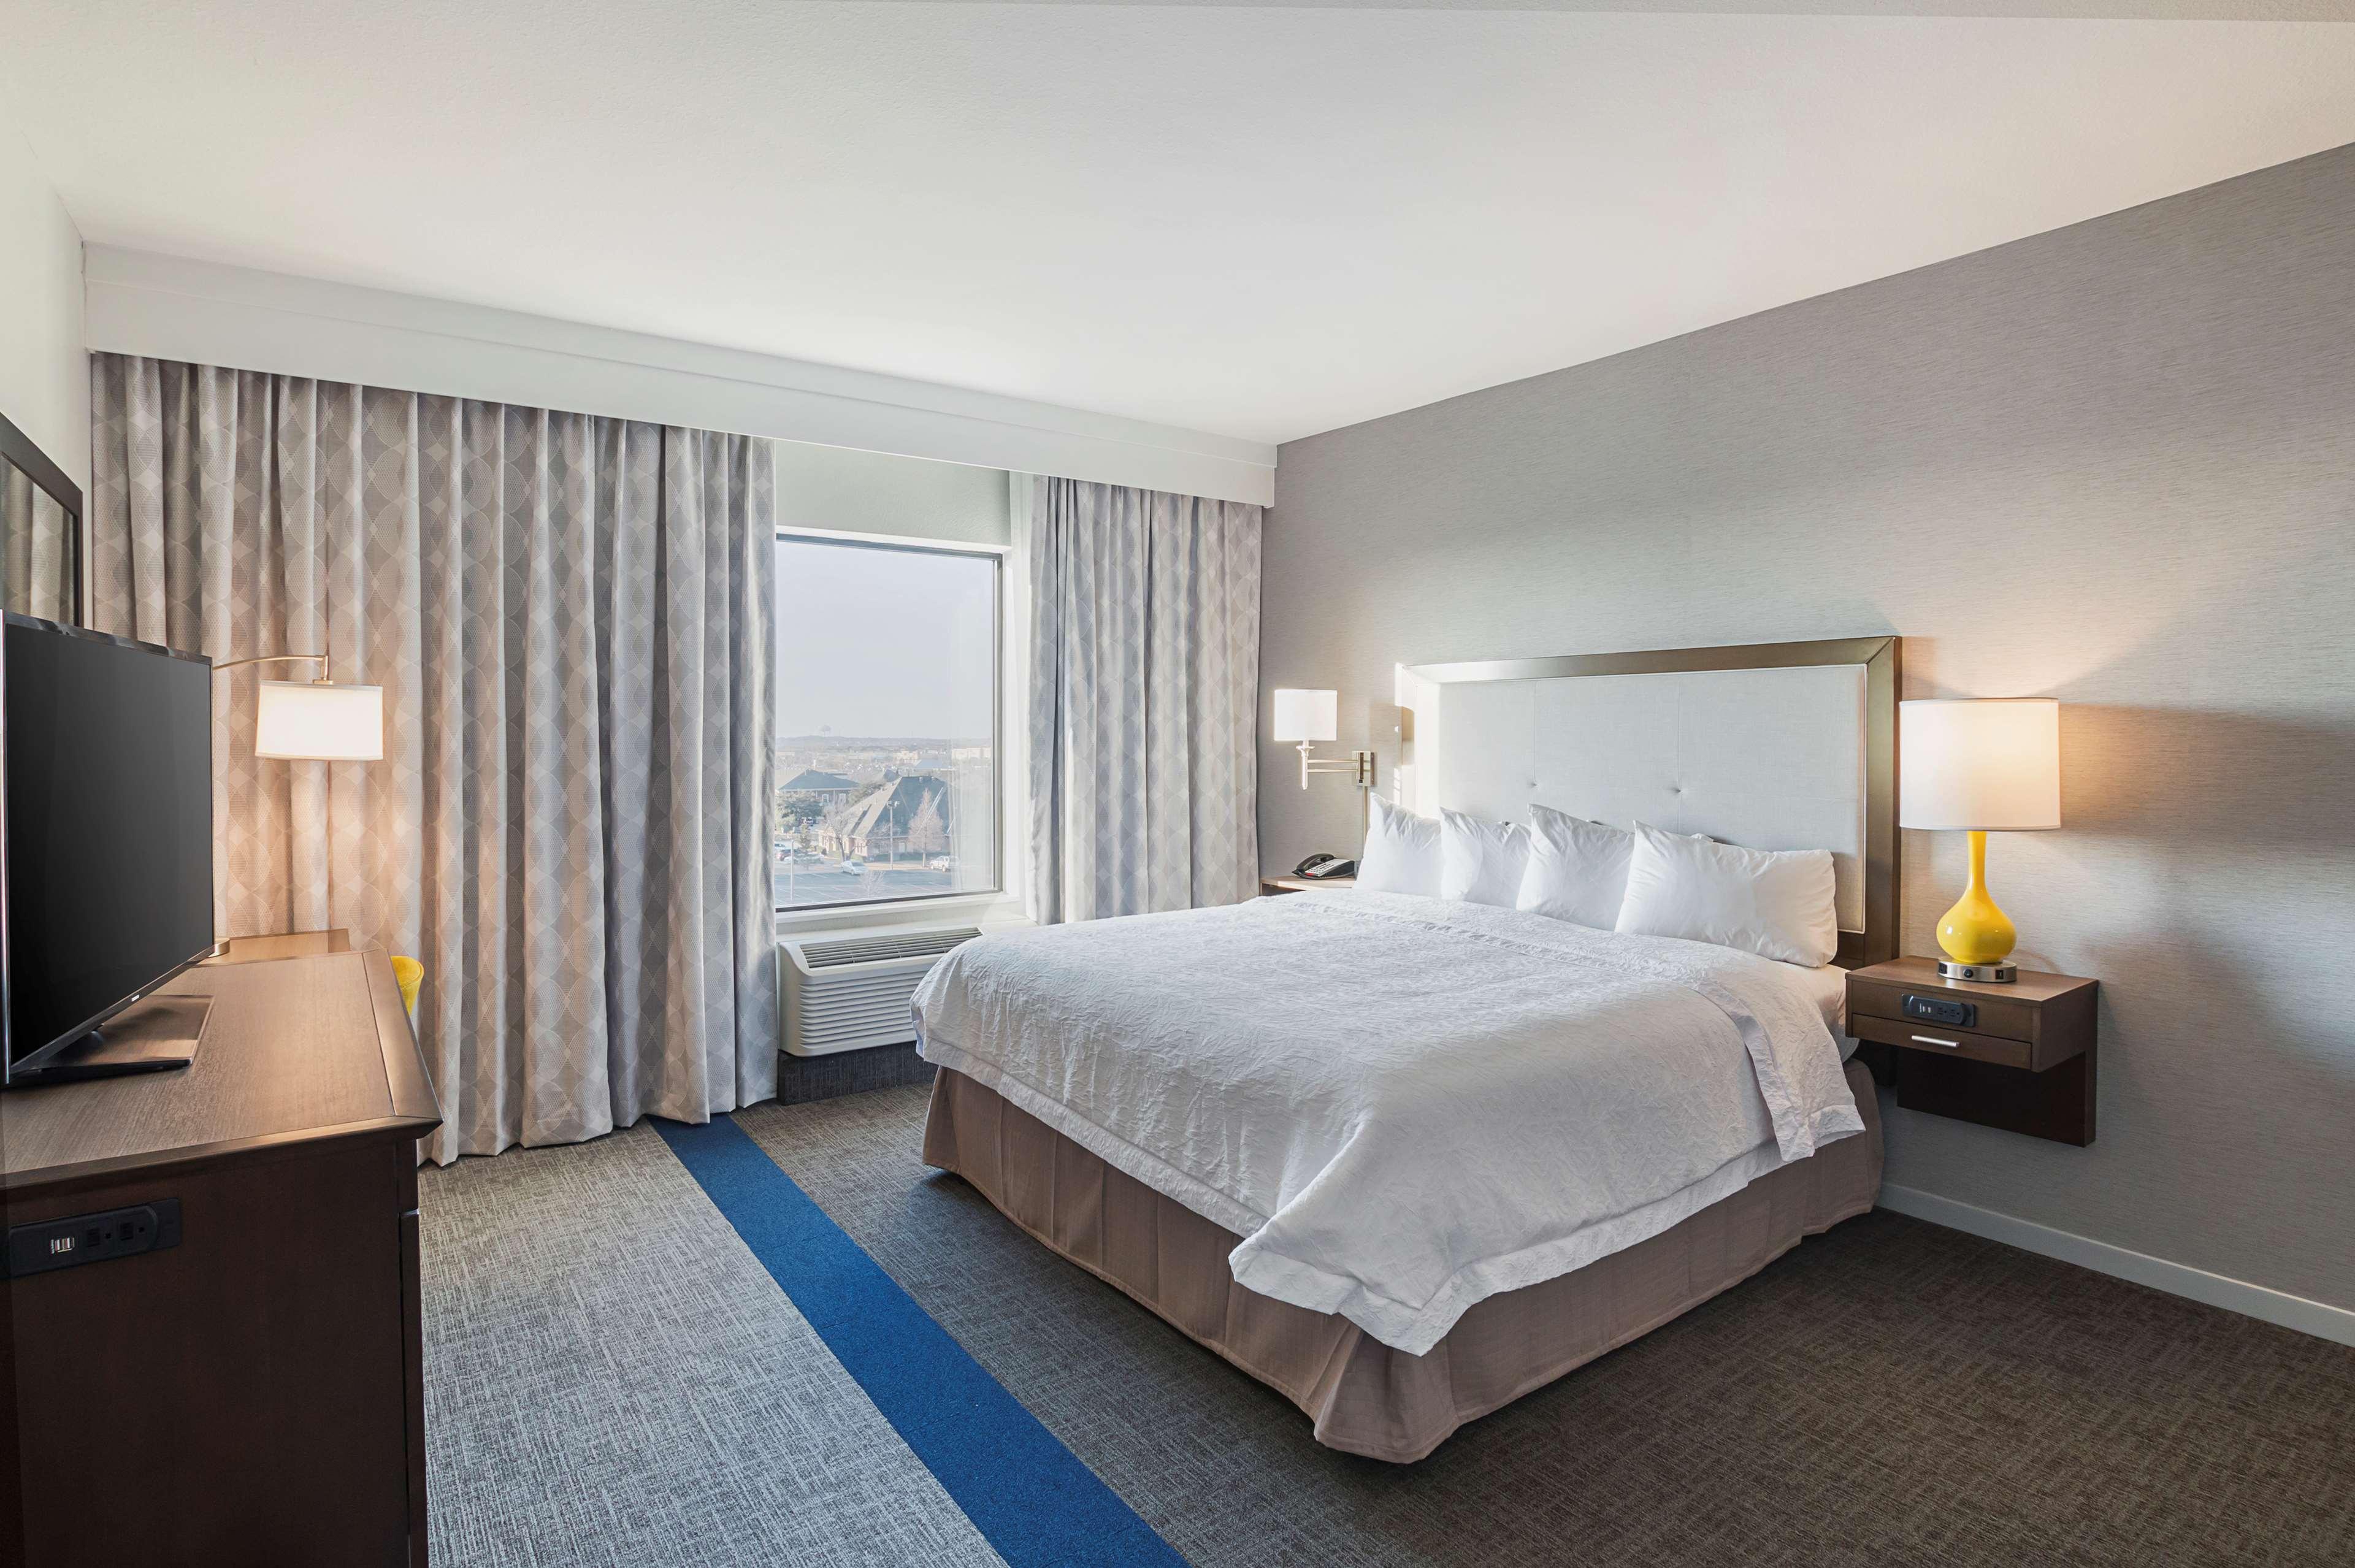 Hampton Inn & Suites Colleyville DFW West image 38